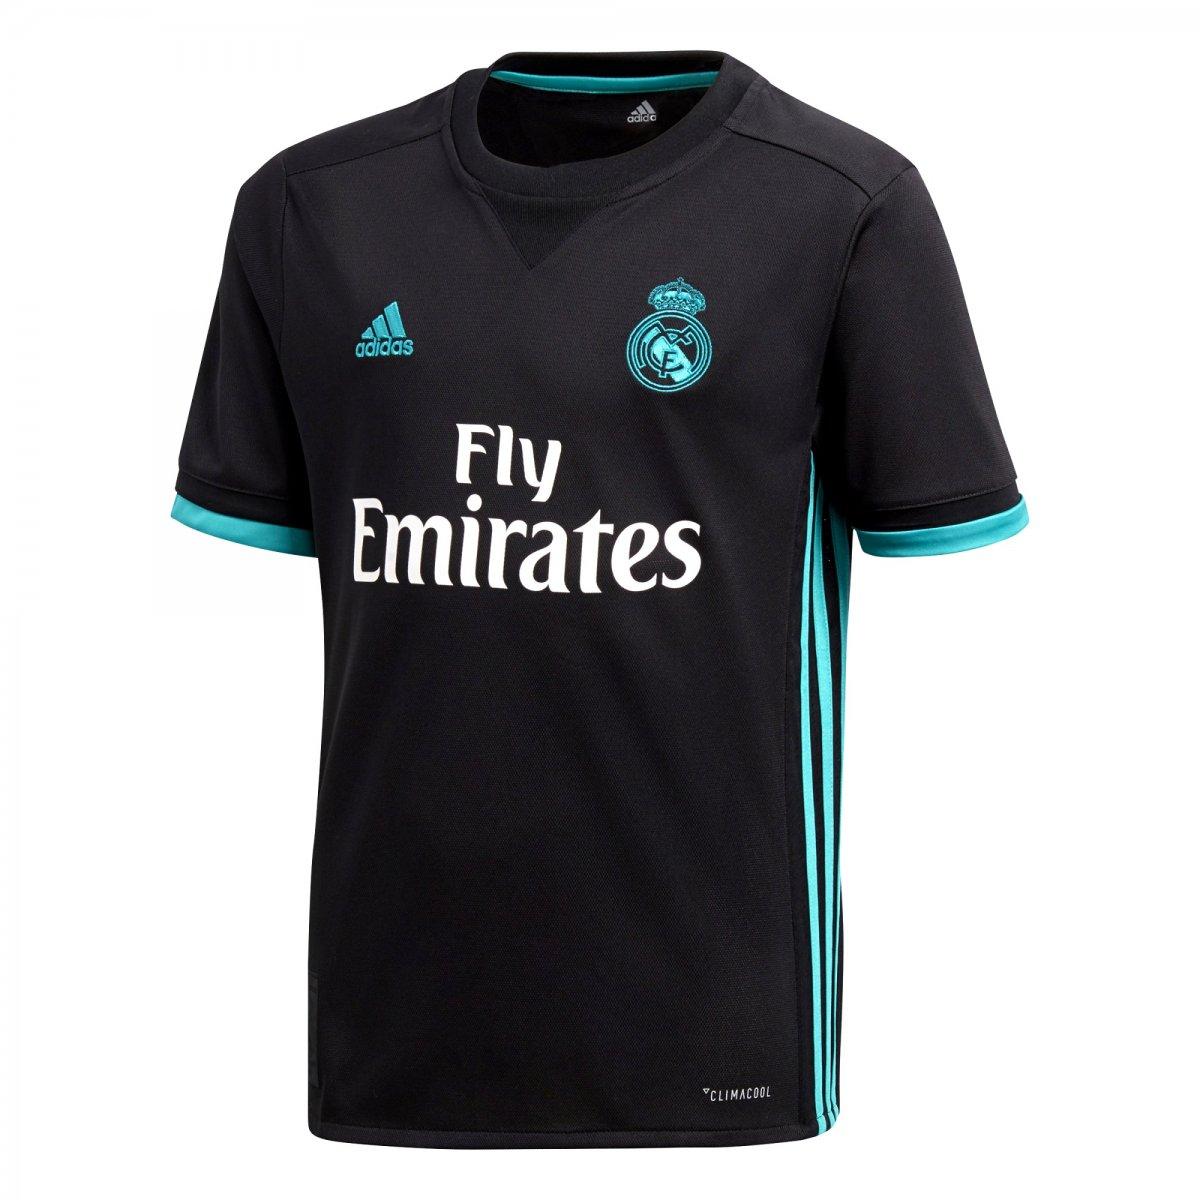 f01a81419 Camisa Infantil Adidas Real Madrid 2 B31092 - Preto Turquesa - Botas ...